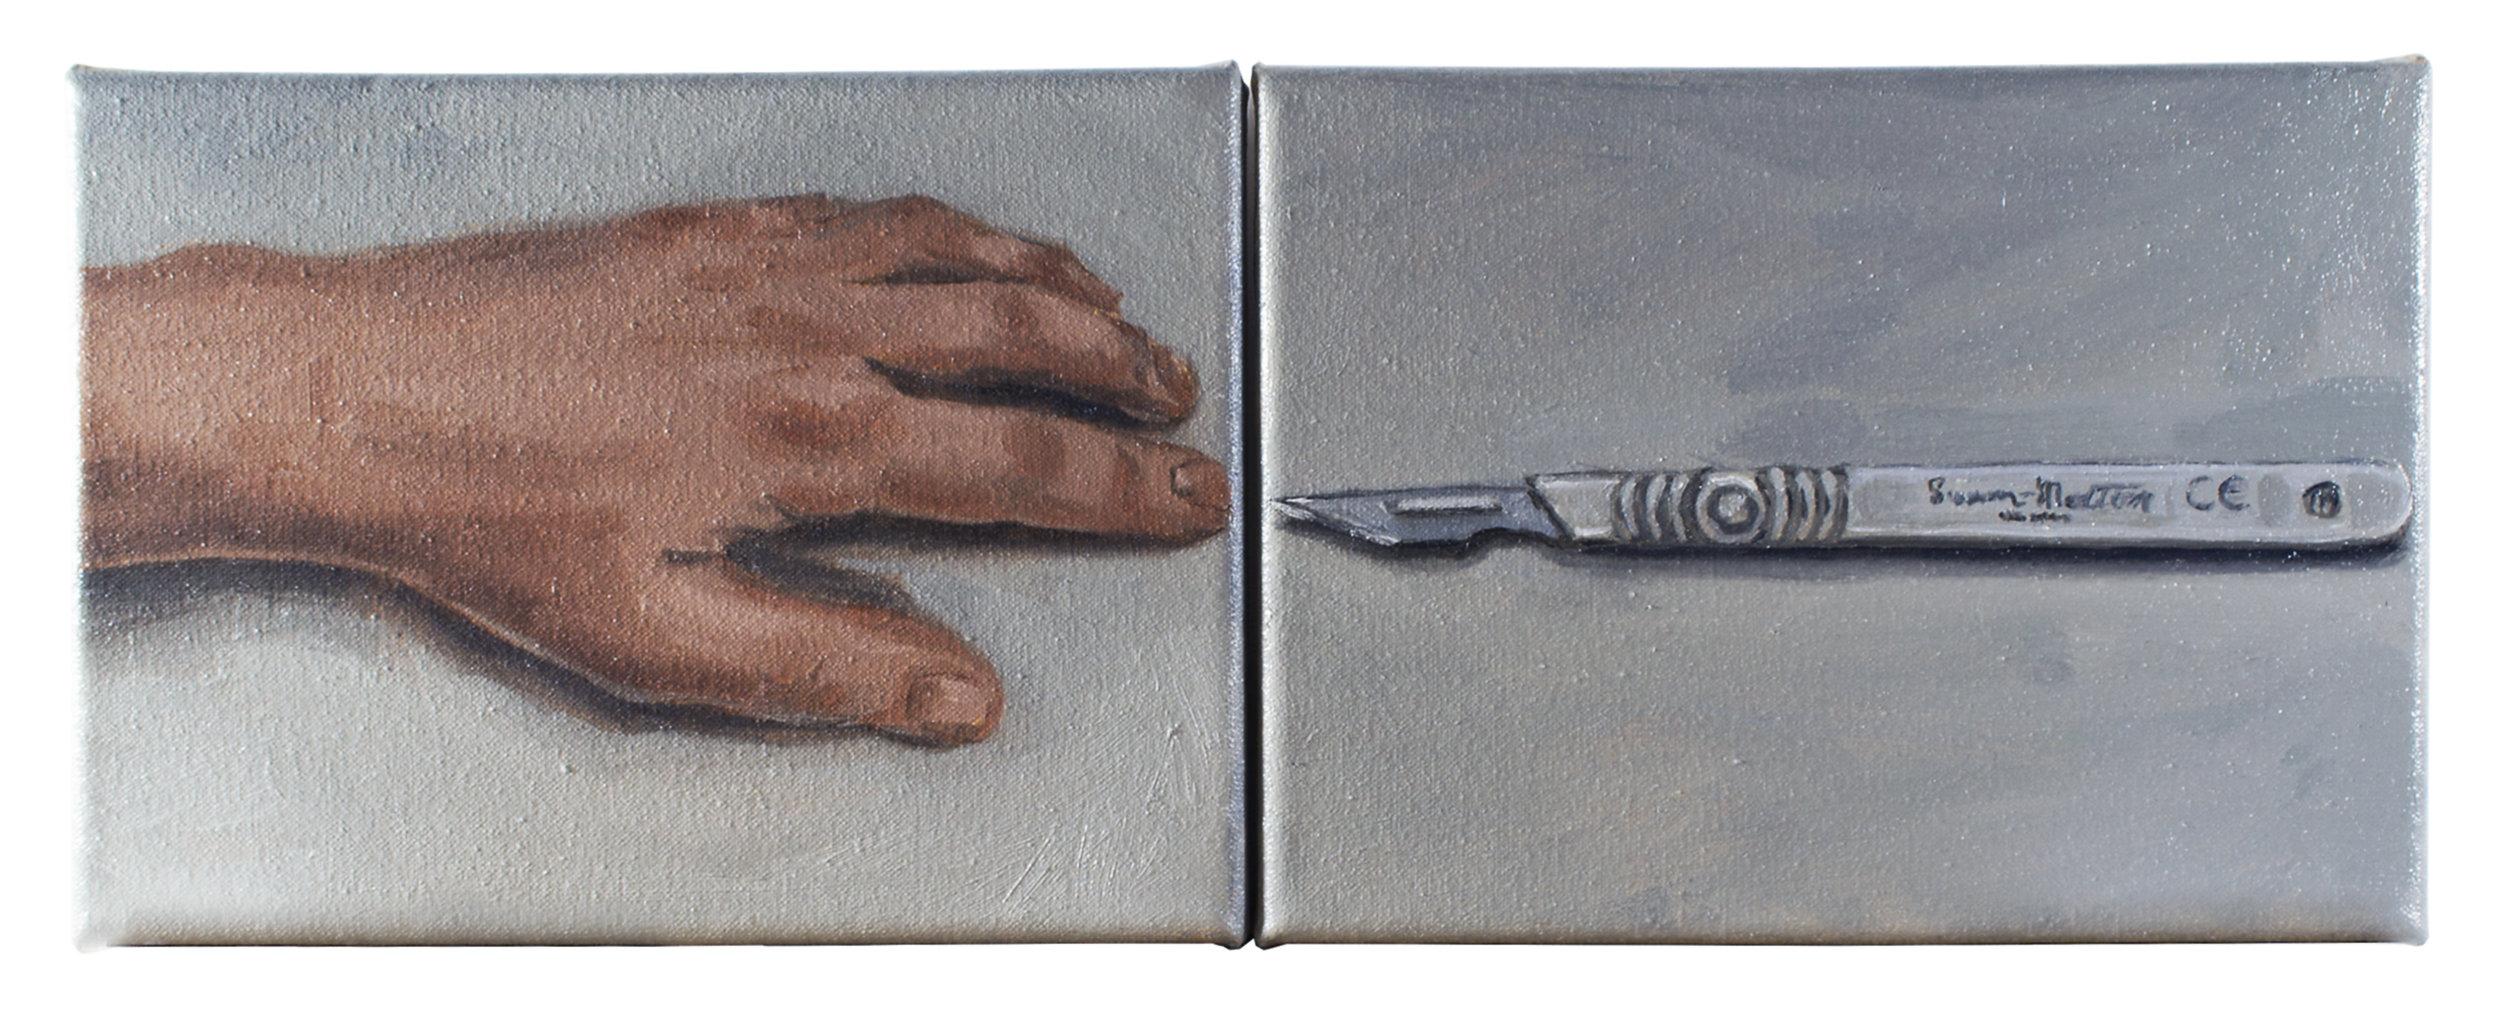 Hand/Scalpel